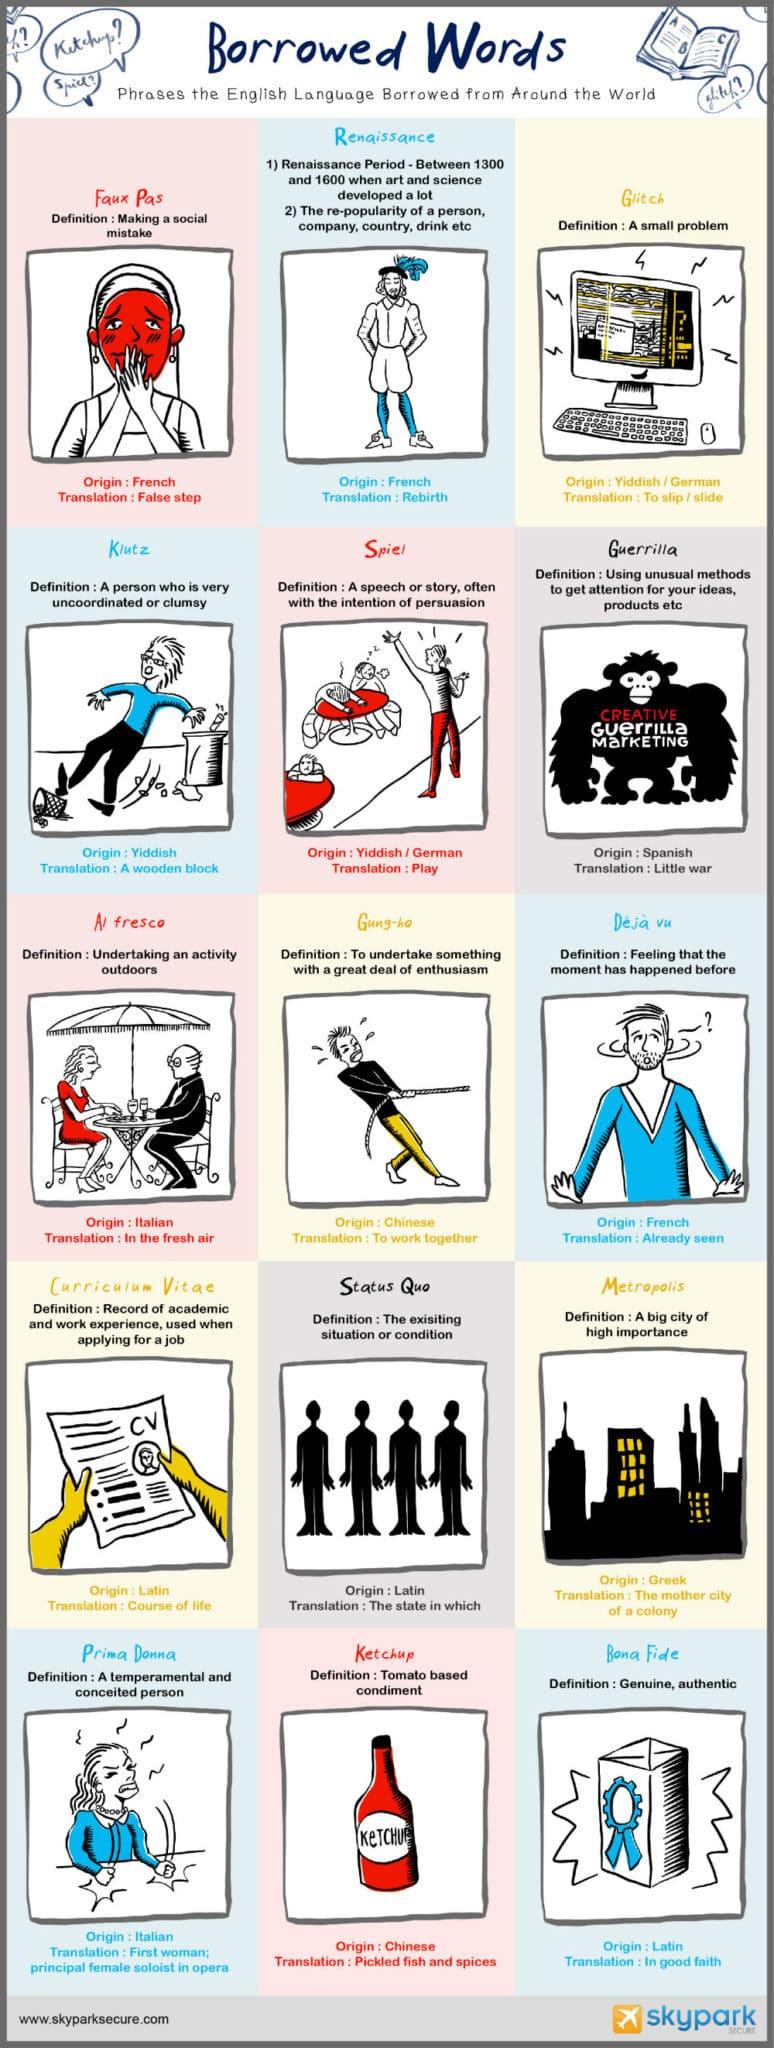 Borrowed Words English Language Infographic